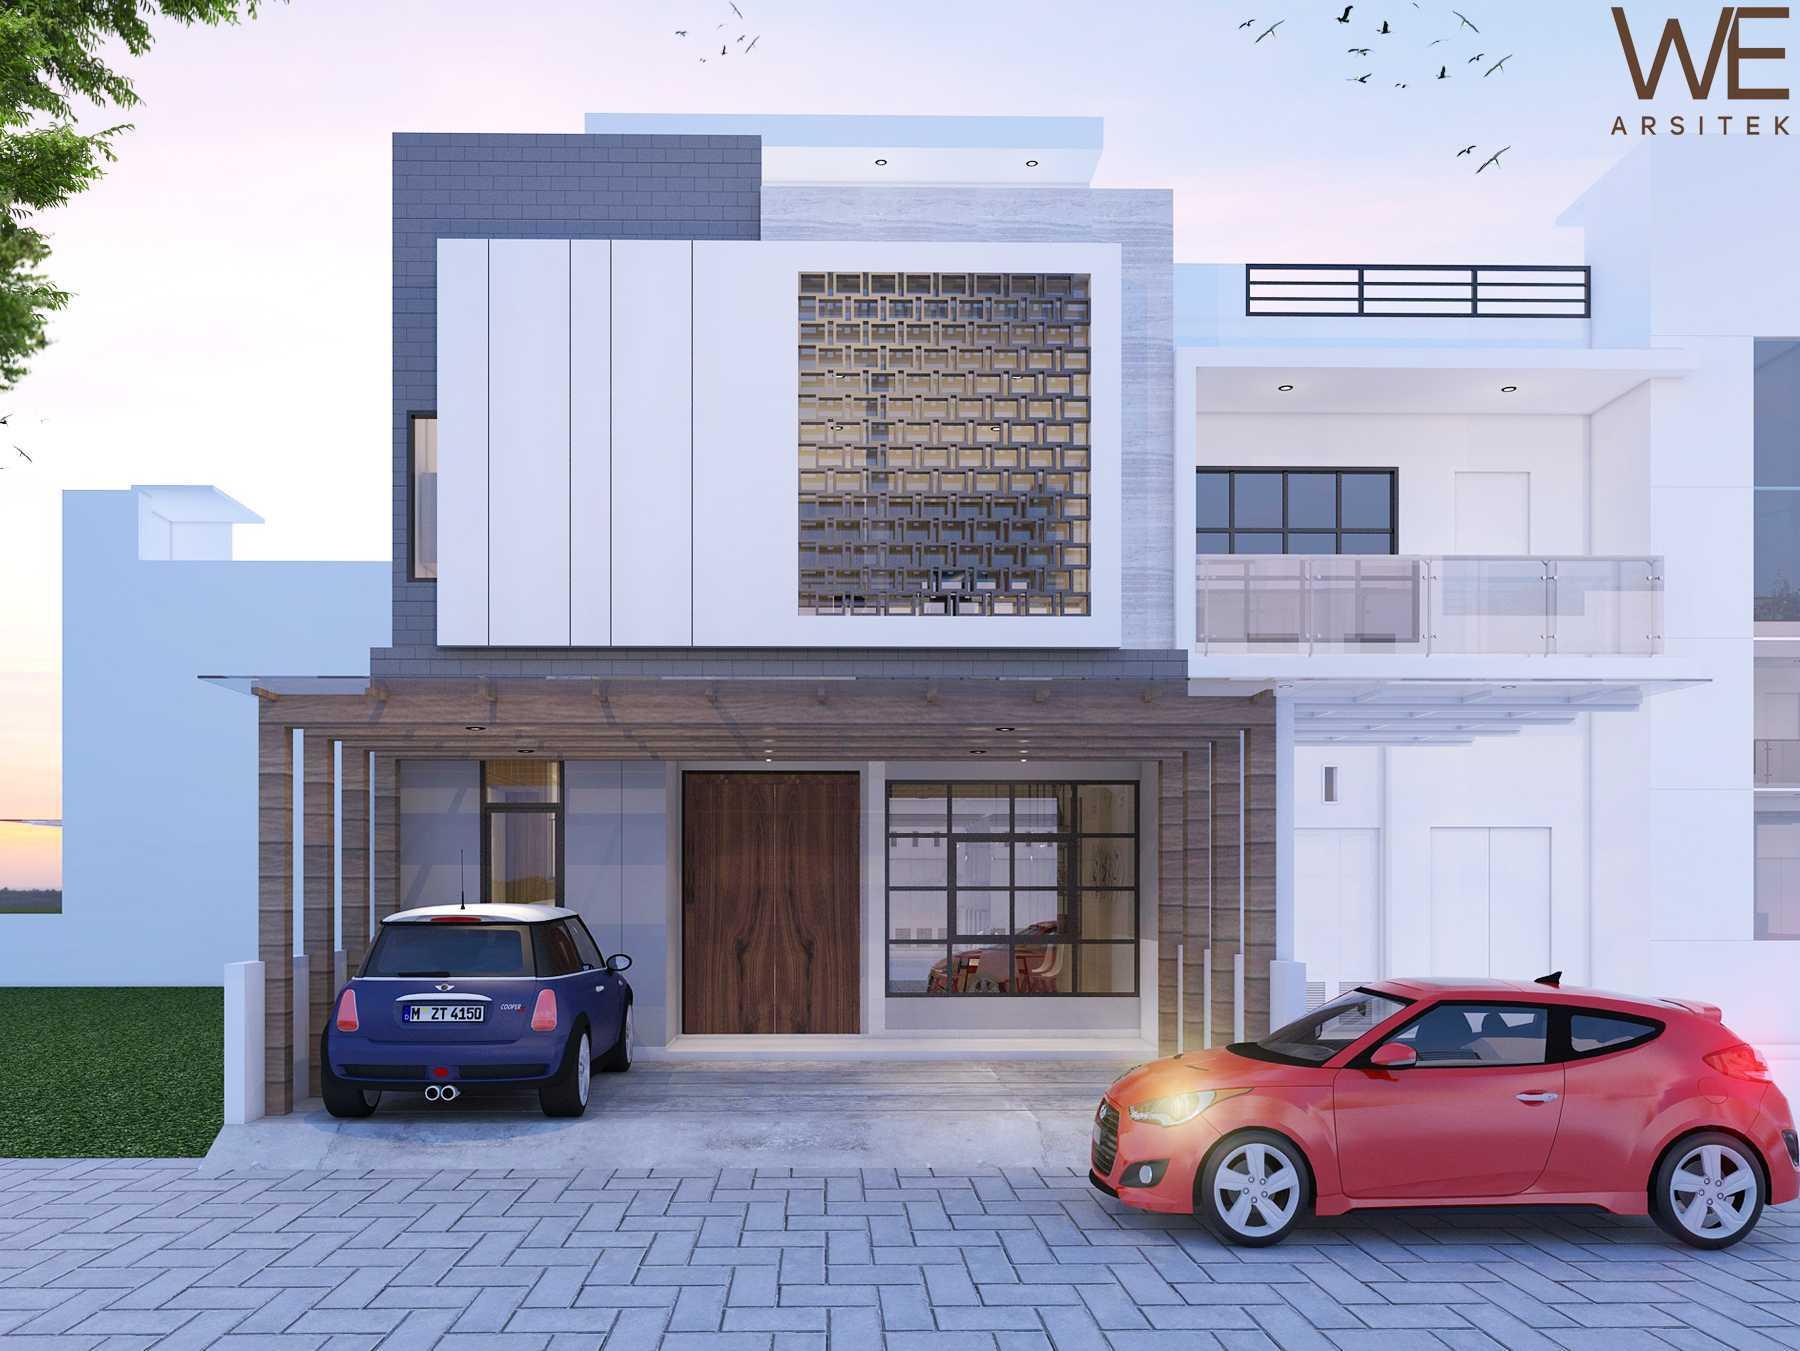 We Arsitek Li Residence - Contemporary Kota Medan, Sumatera Utara, Indonesia Kota Medan, Sumatera Utara, Indonesia Front View Rendering   45721